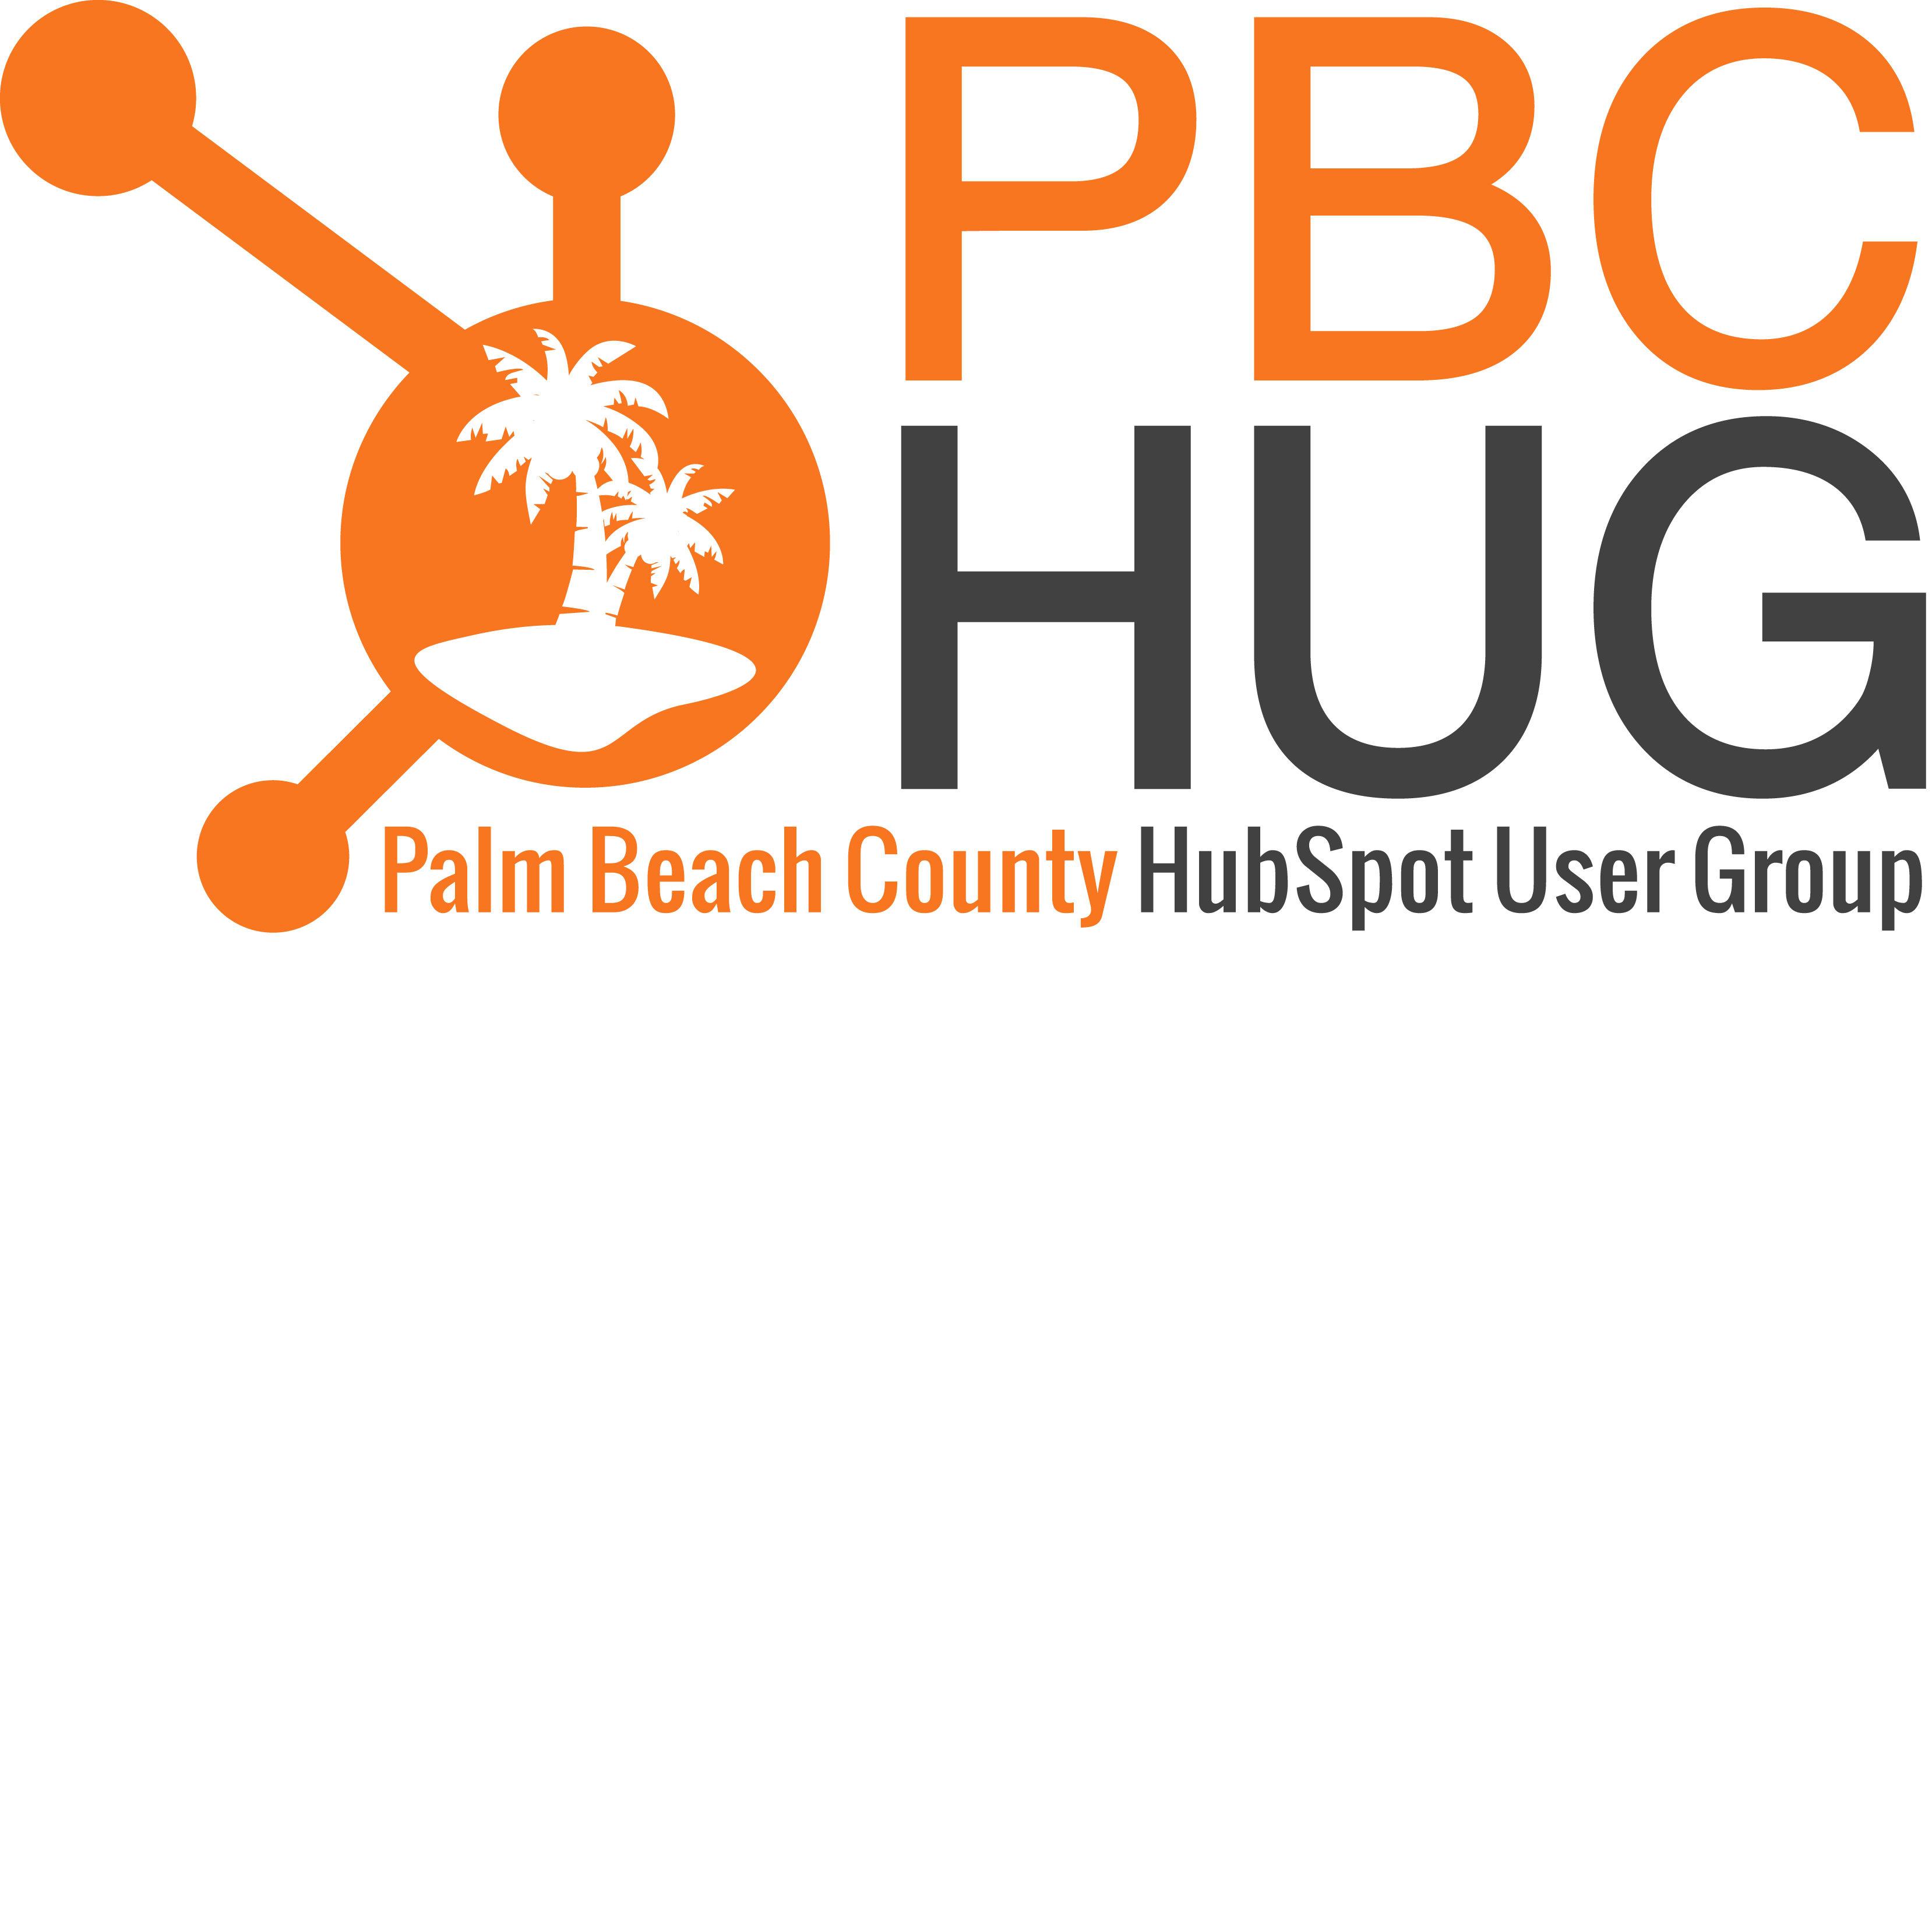 Palm Beach County HubSpot User Group (formerly Boca Raton HubSpot User Group)